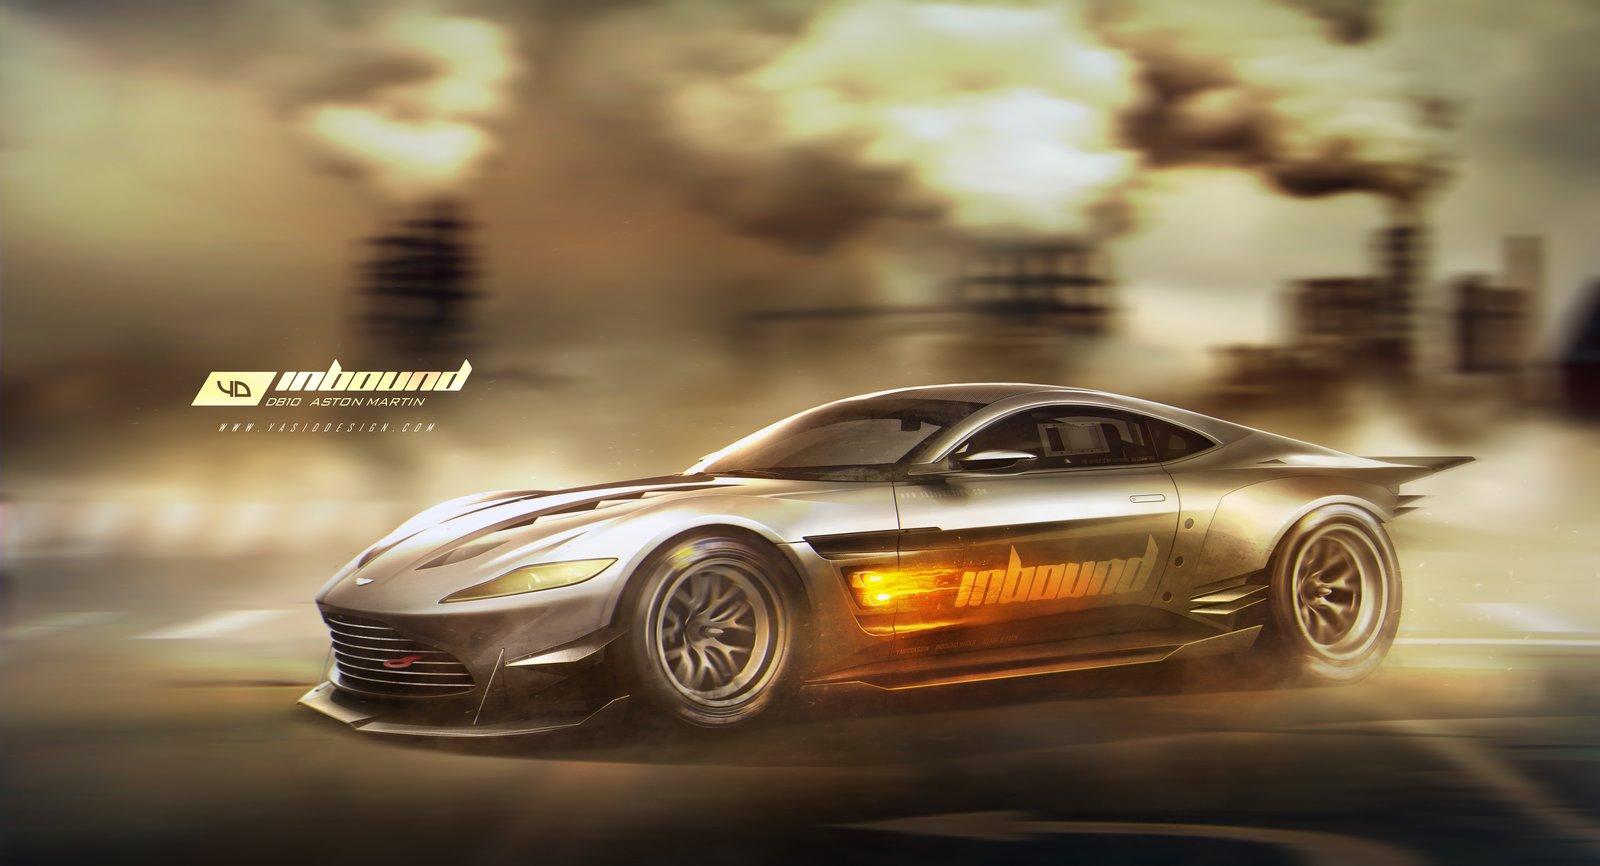 DB 10 Aston Martin - motion